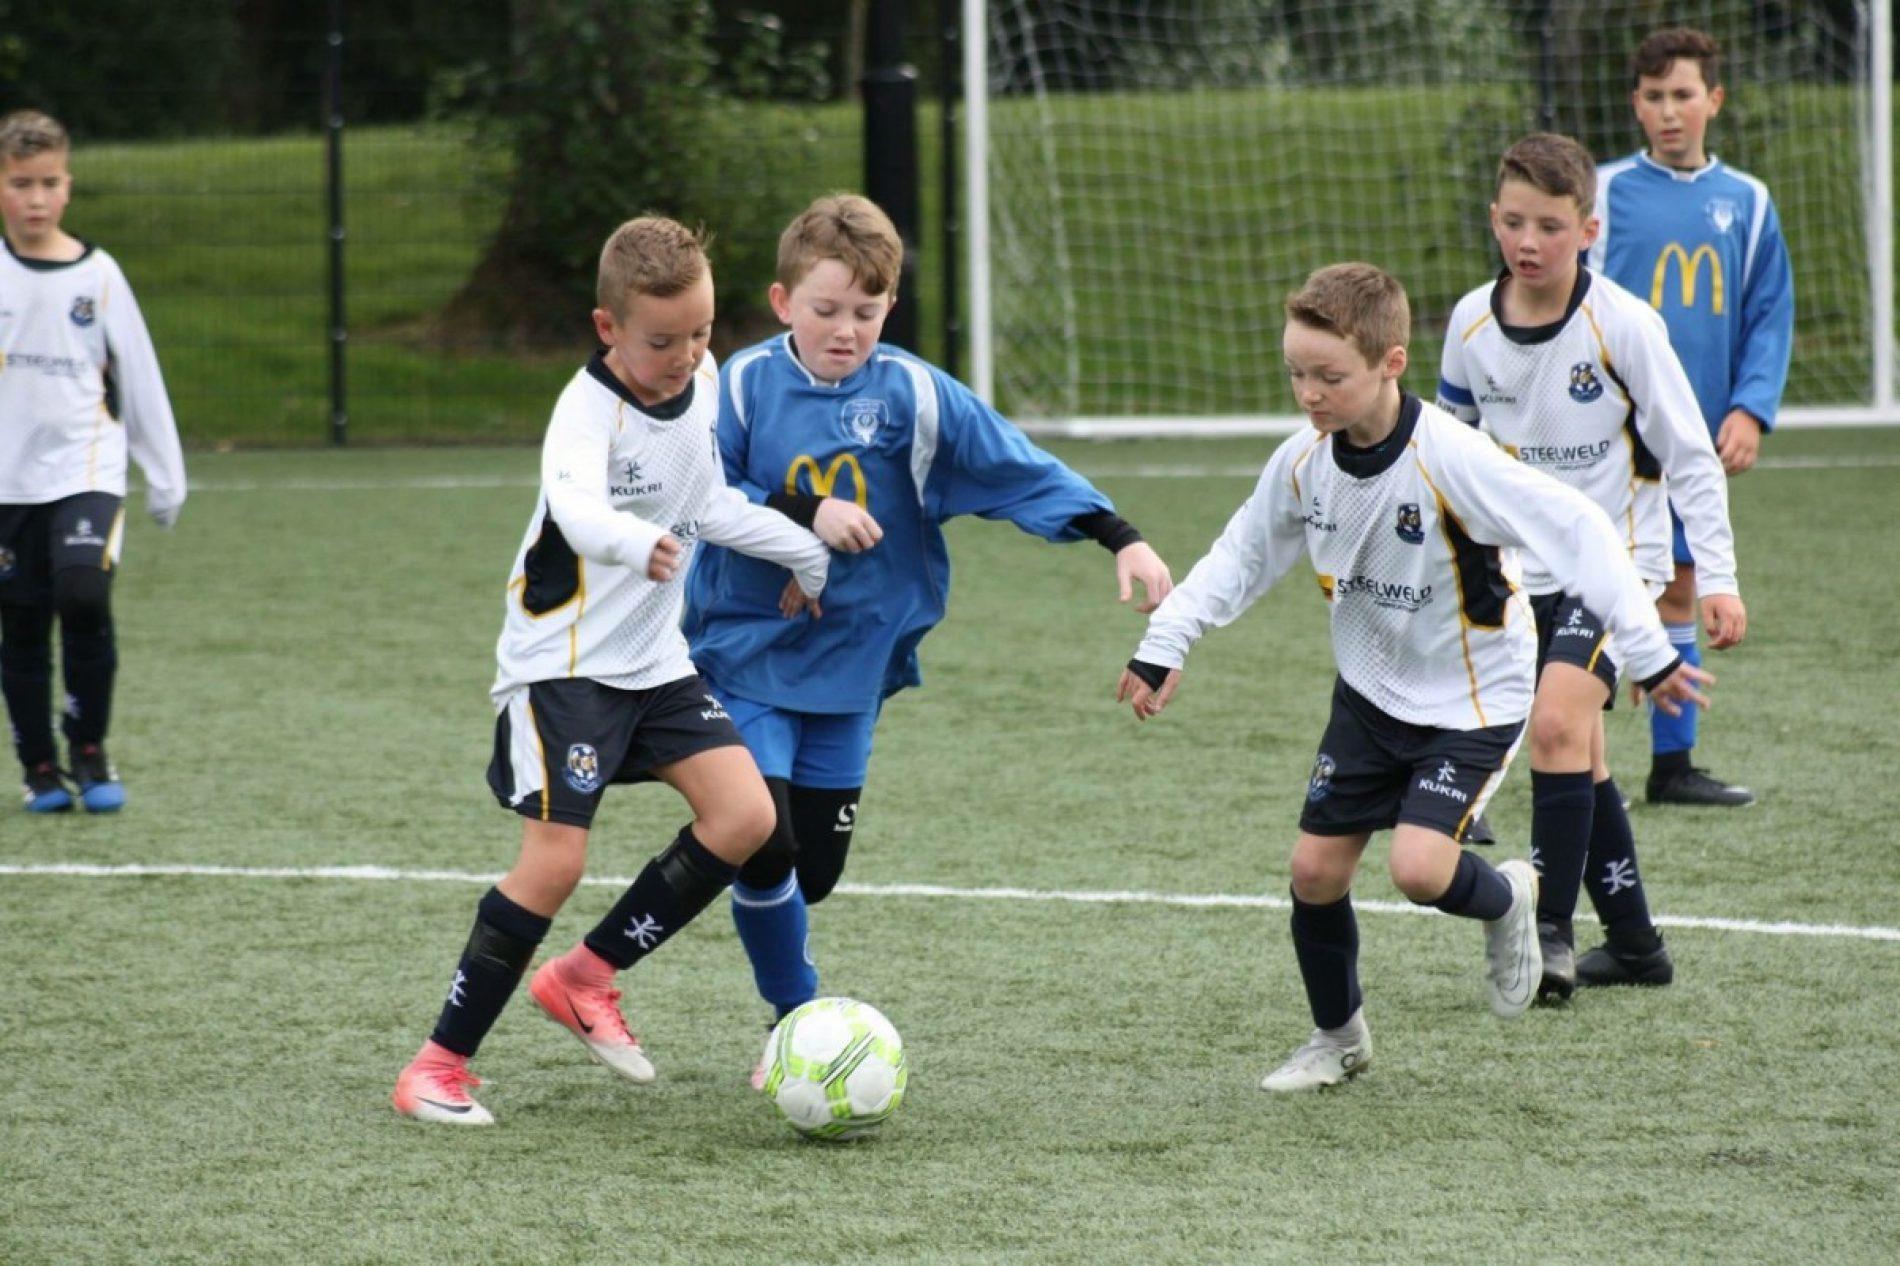 15/09/18 – CYFC Match Reports